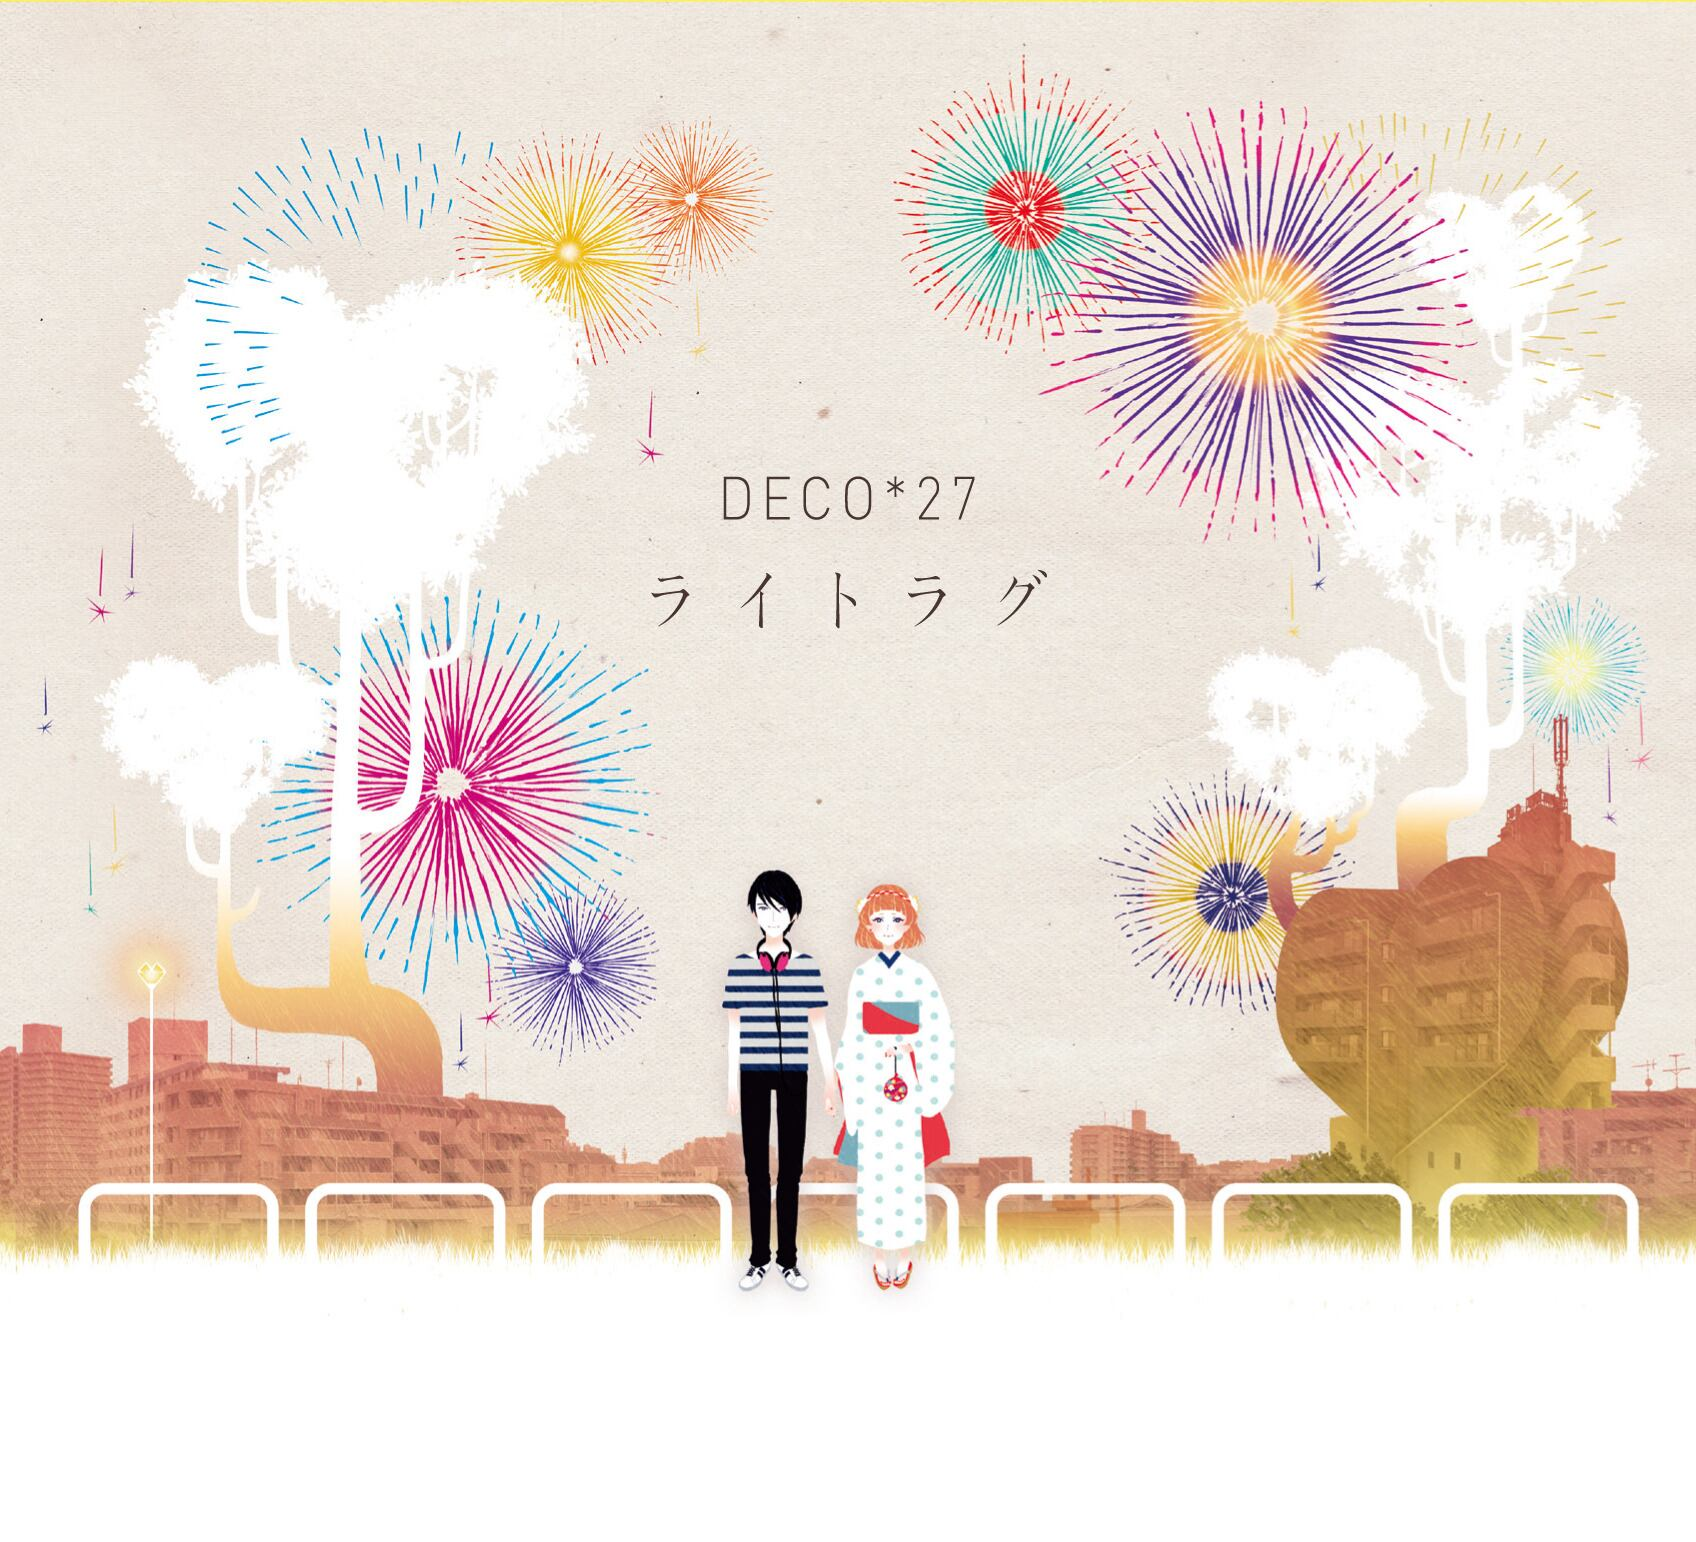 DECO*27 / ライトラグ(初回生産限定盤) - 画像1